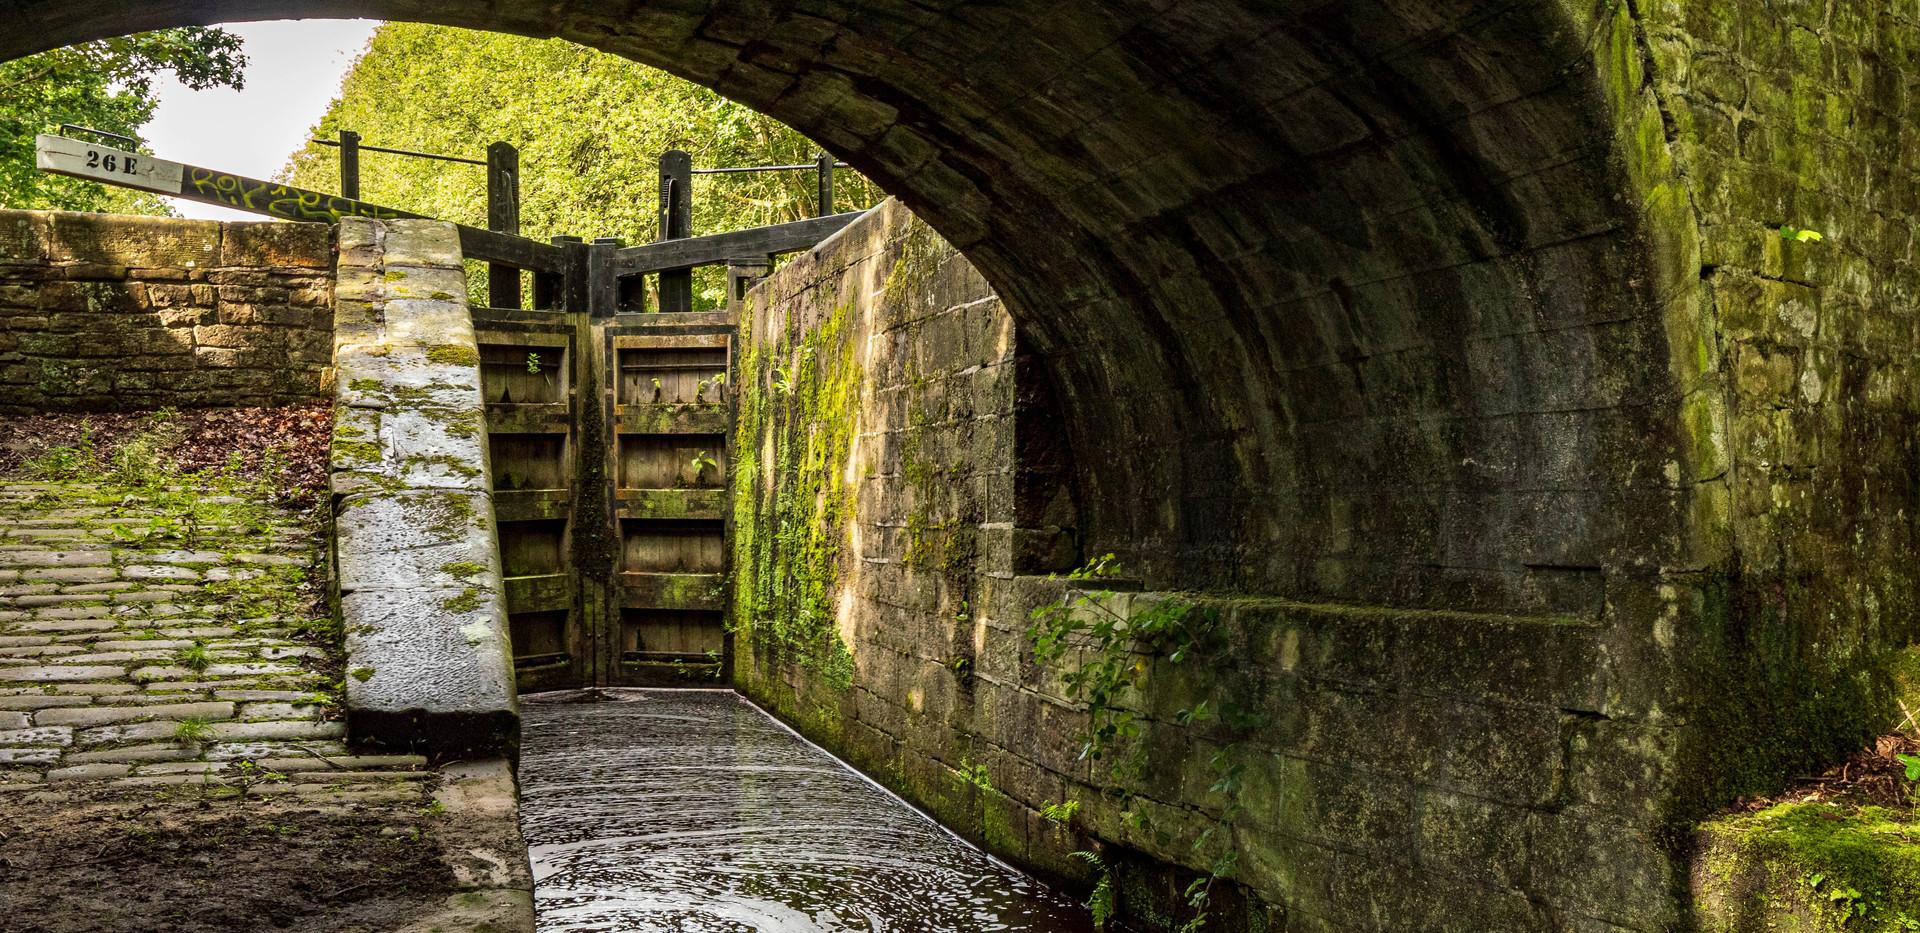 Canals-15.jpg